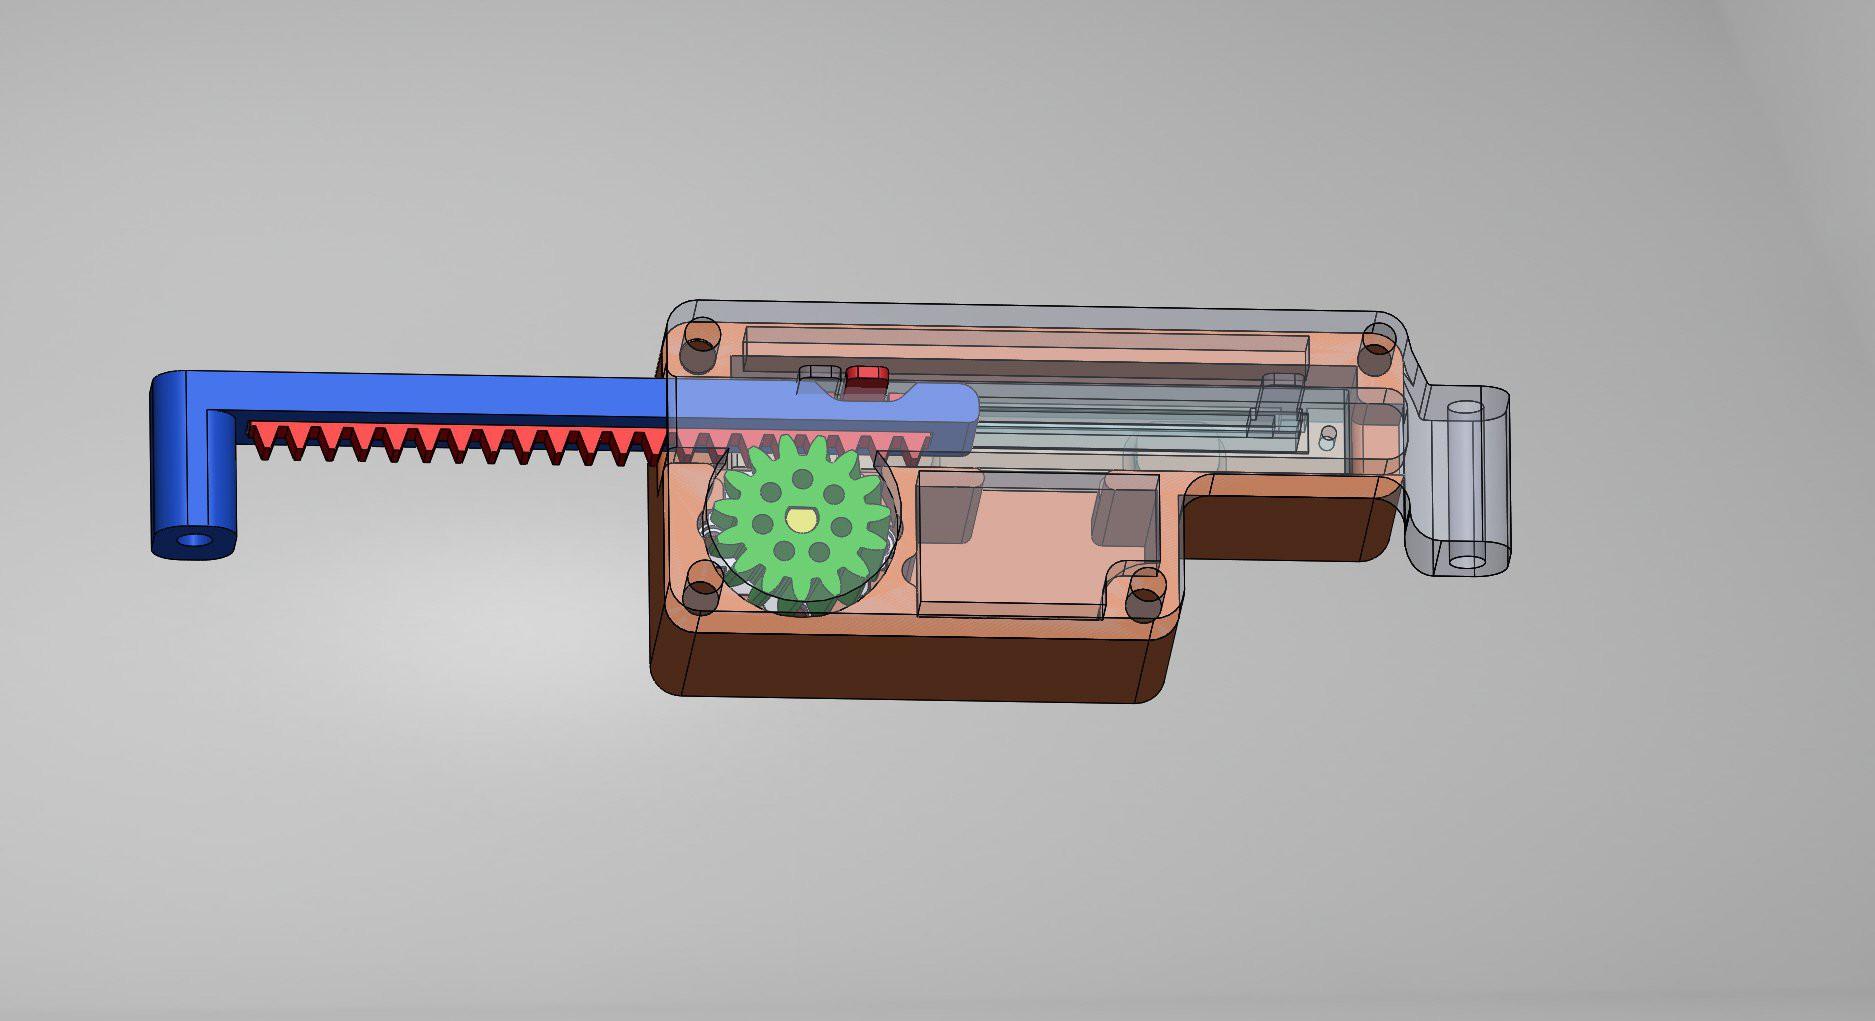 Gallery | 3D-Printed DIY Linear Servo | Hackaday.io